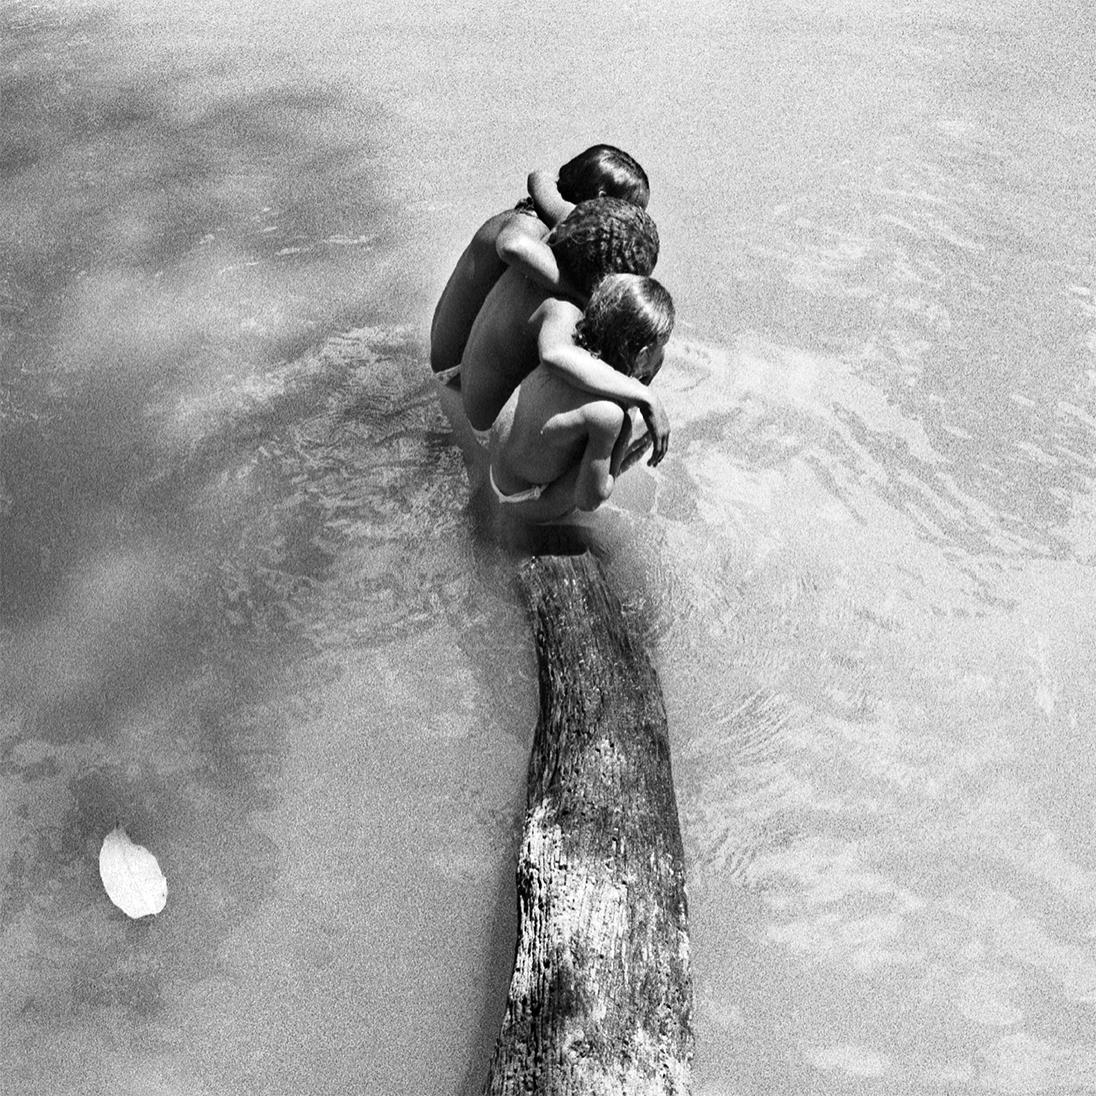 Uimarit Bagé-joella